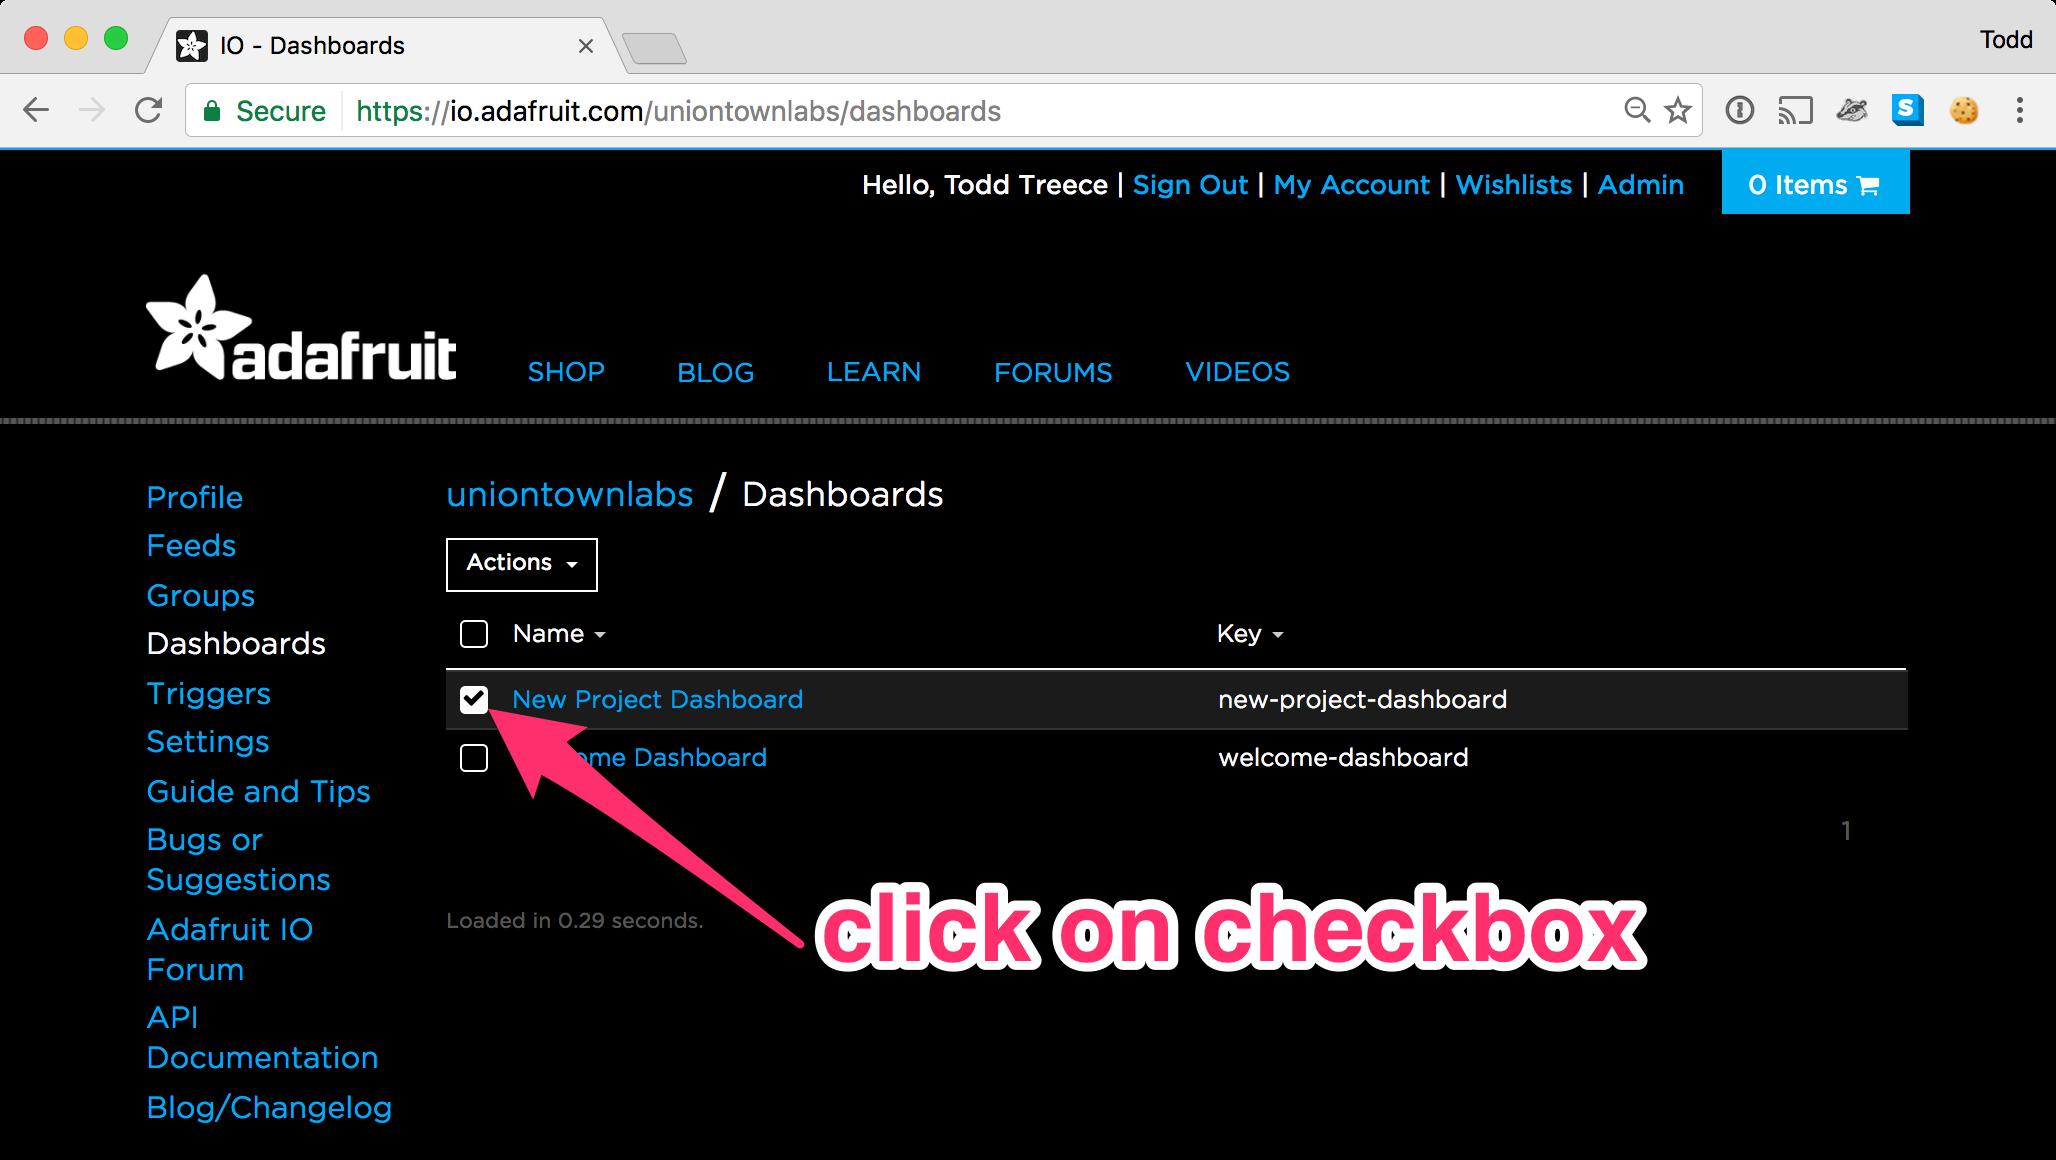 adafruit_io_checkbox.png